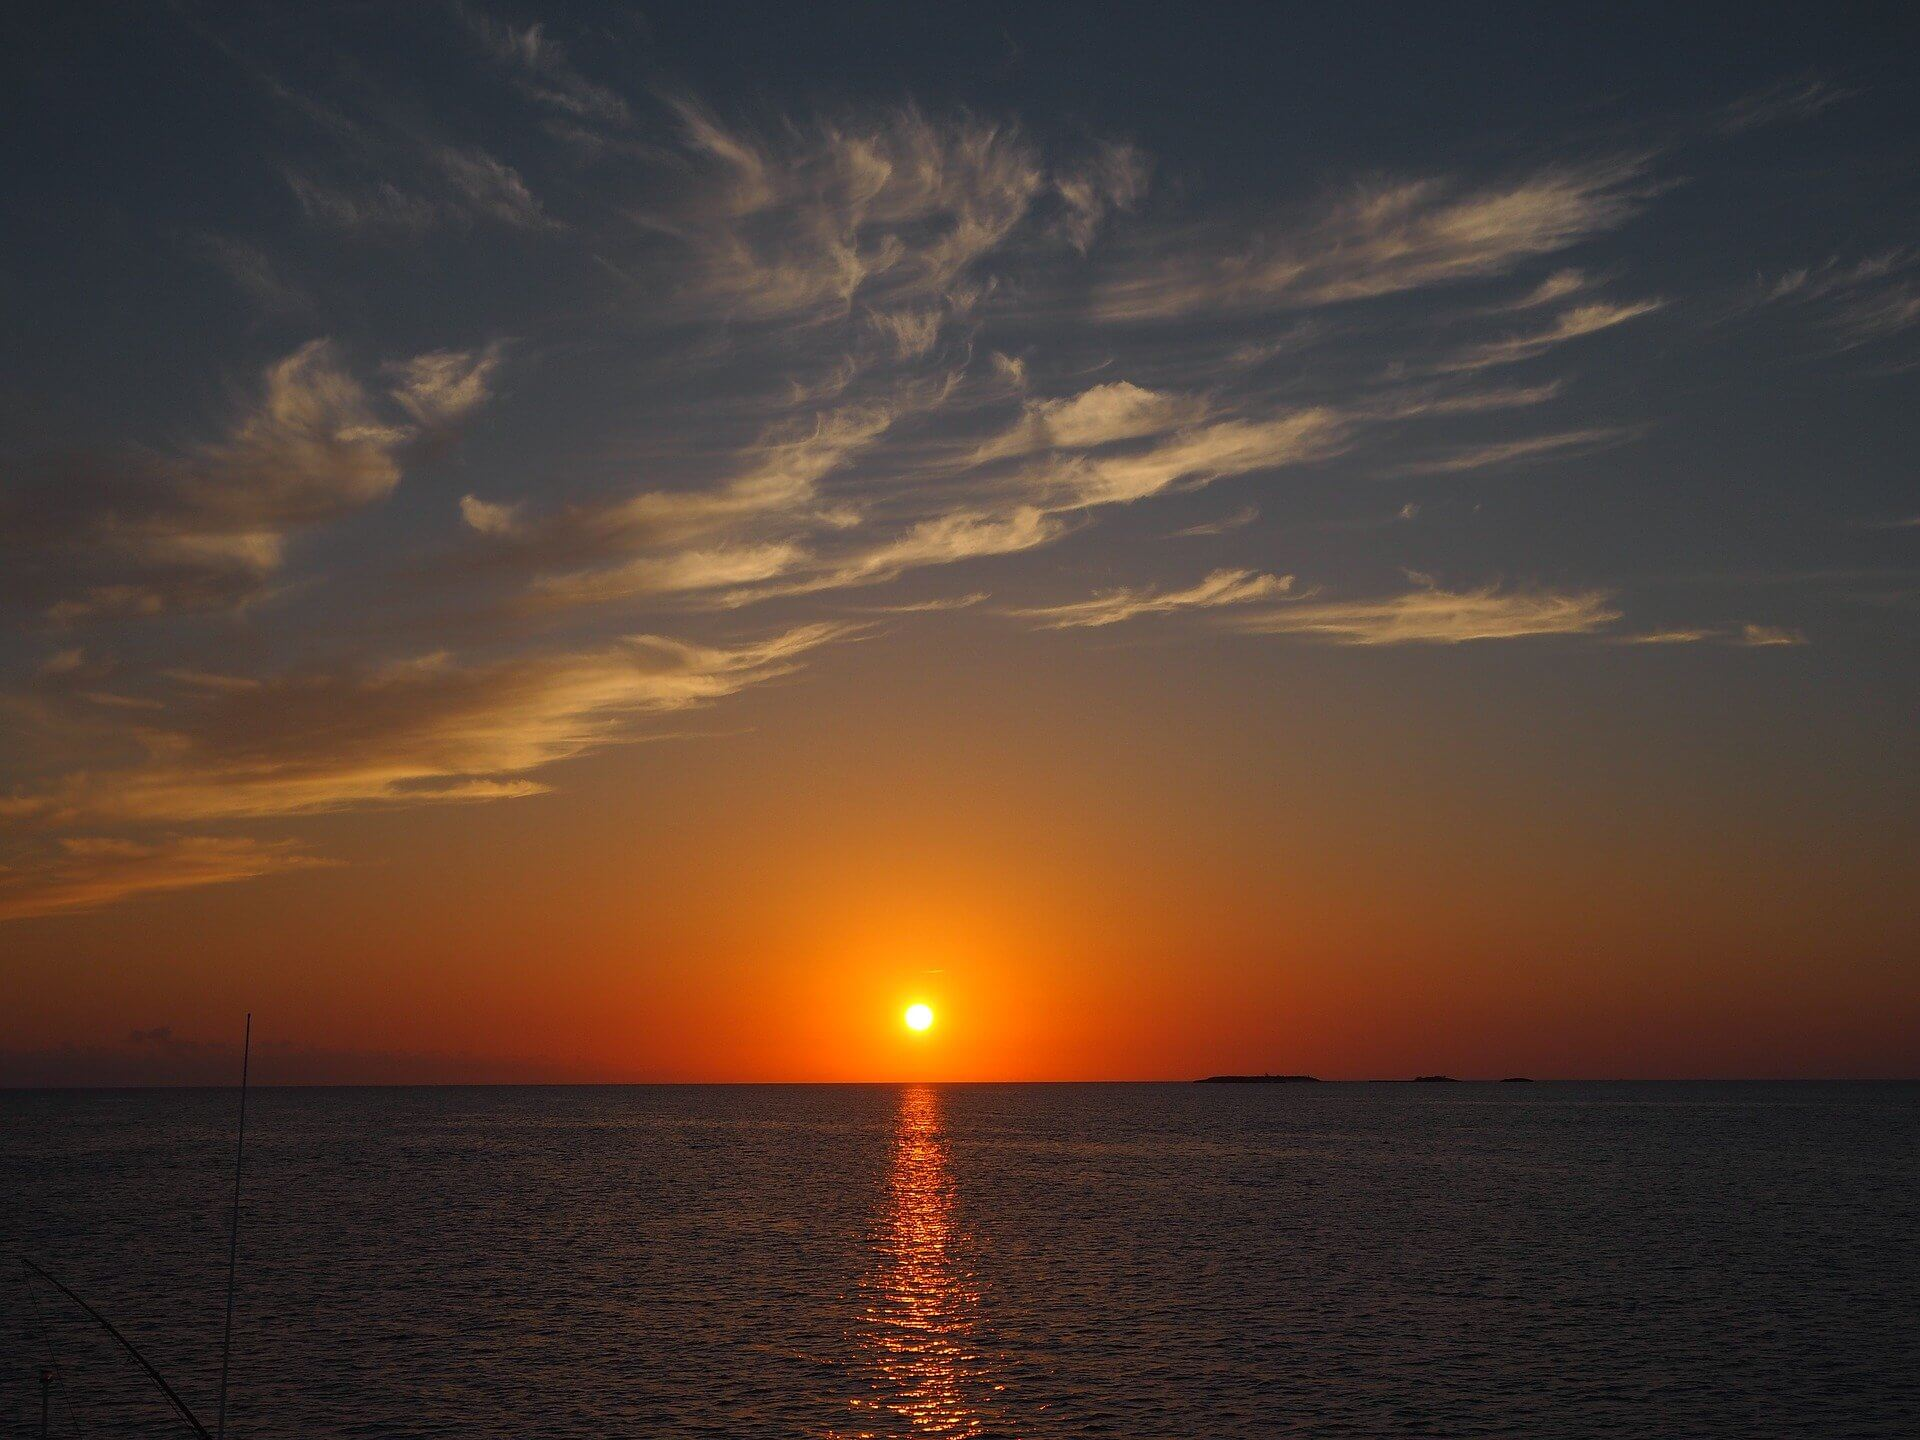 sunset-g05f203701_1920